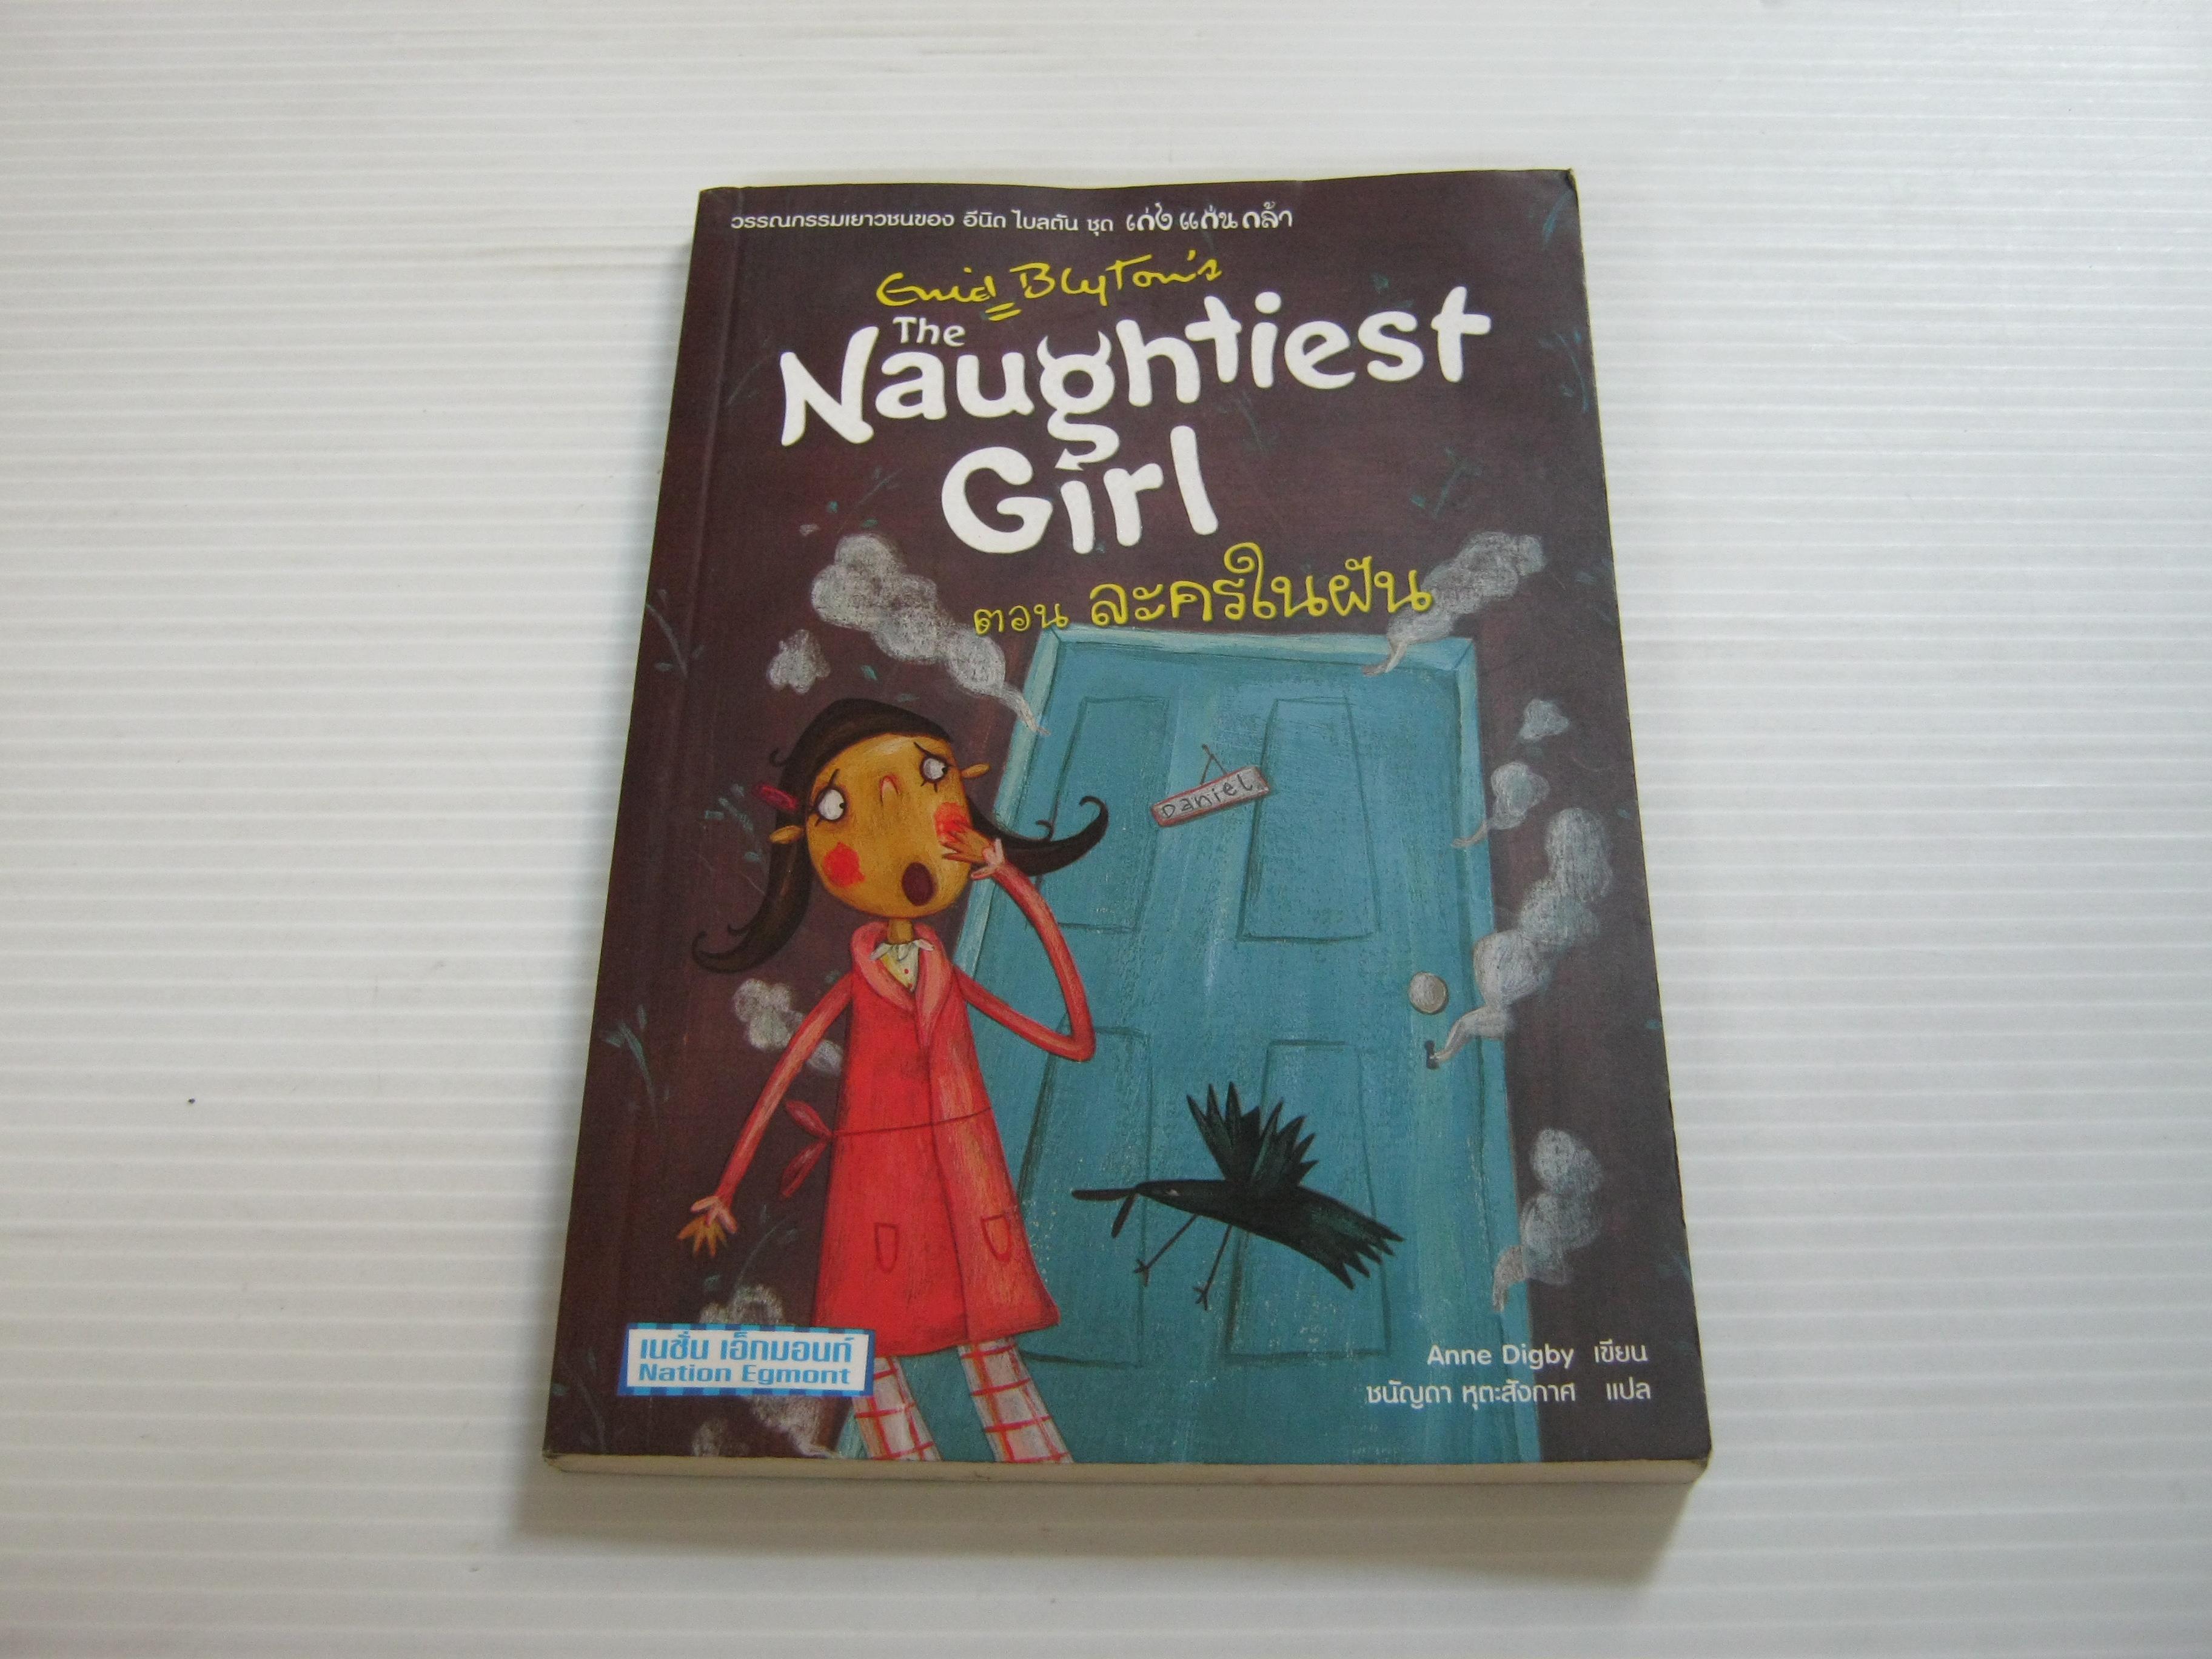 The Naughtiest Girl ตอน ละครในฝัน Anne Digby เขียน ชนัญดา หุตะสังกาศ แปล